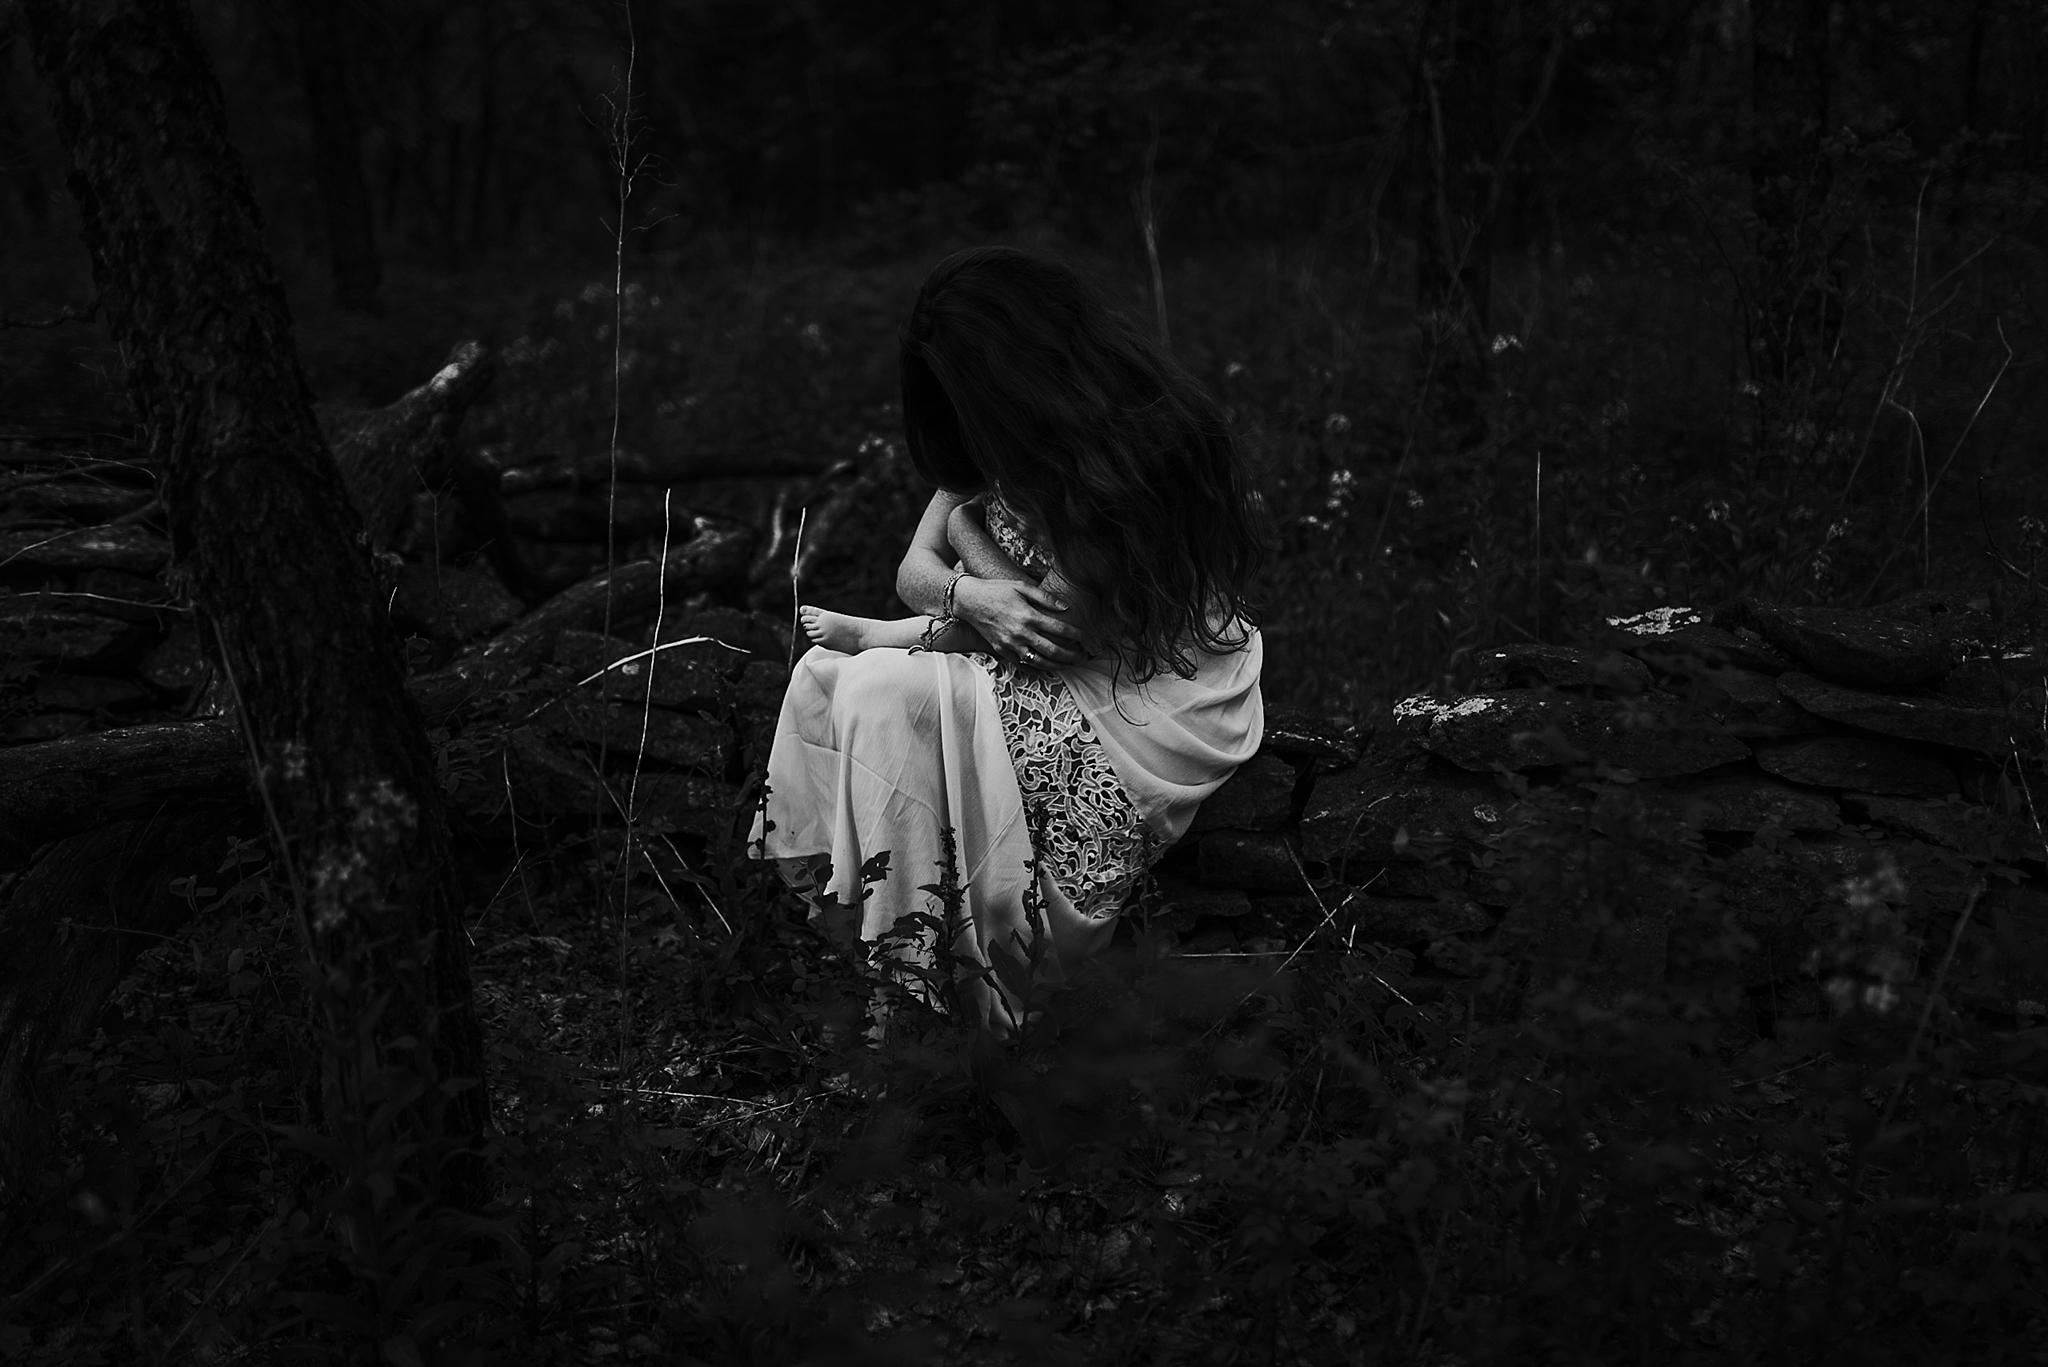 twyla jones photography - mother daughter - field and forest-4743_treasure coast florida.jpg